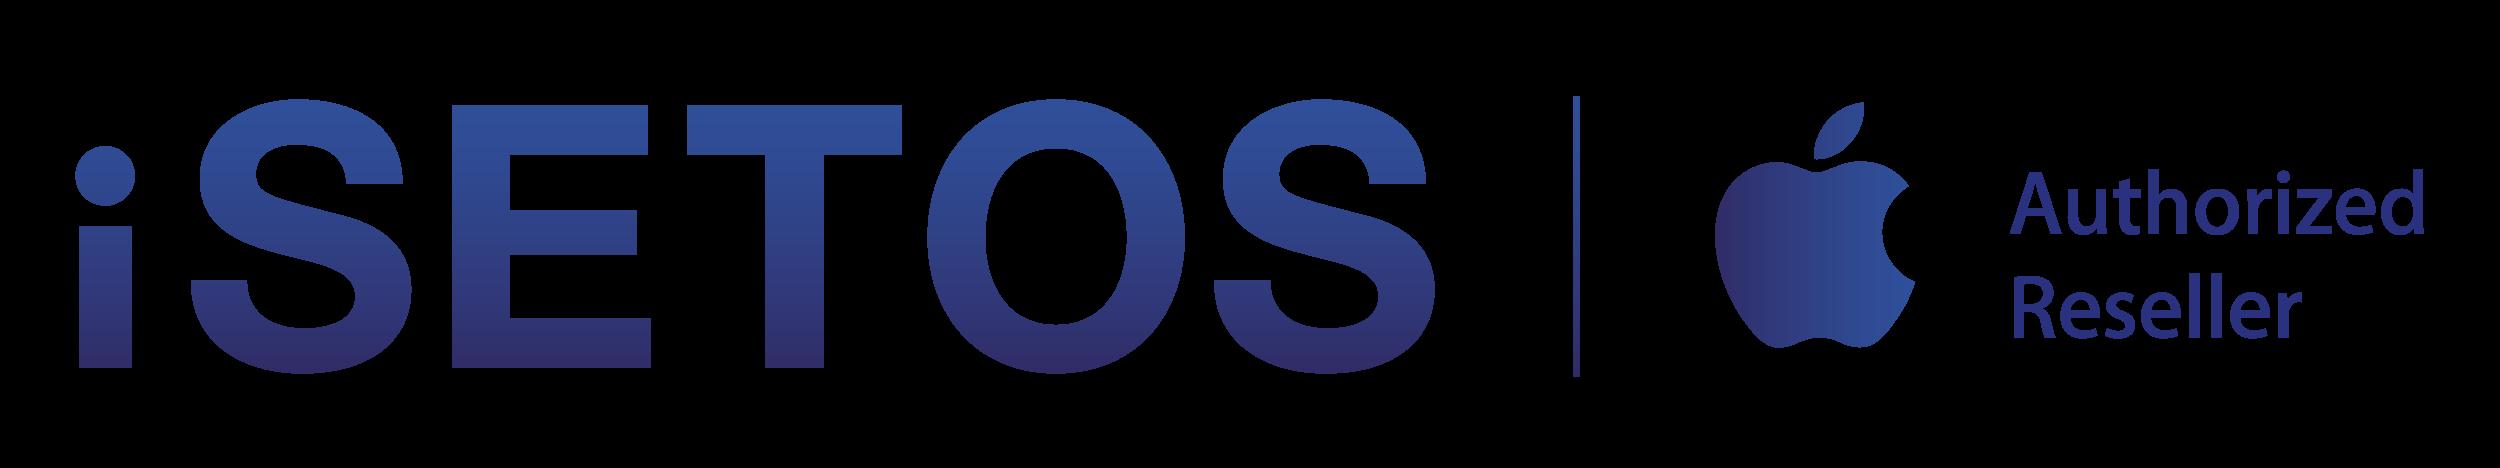 iSetos